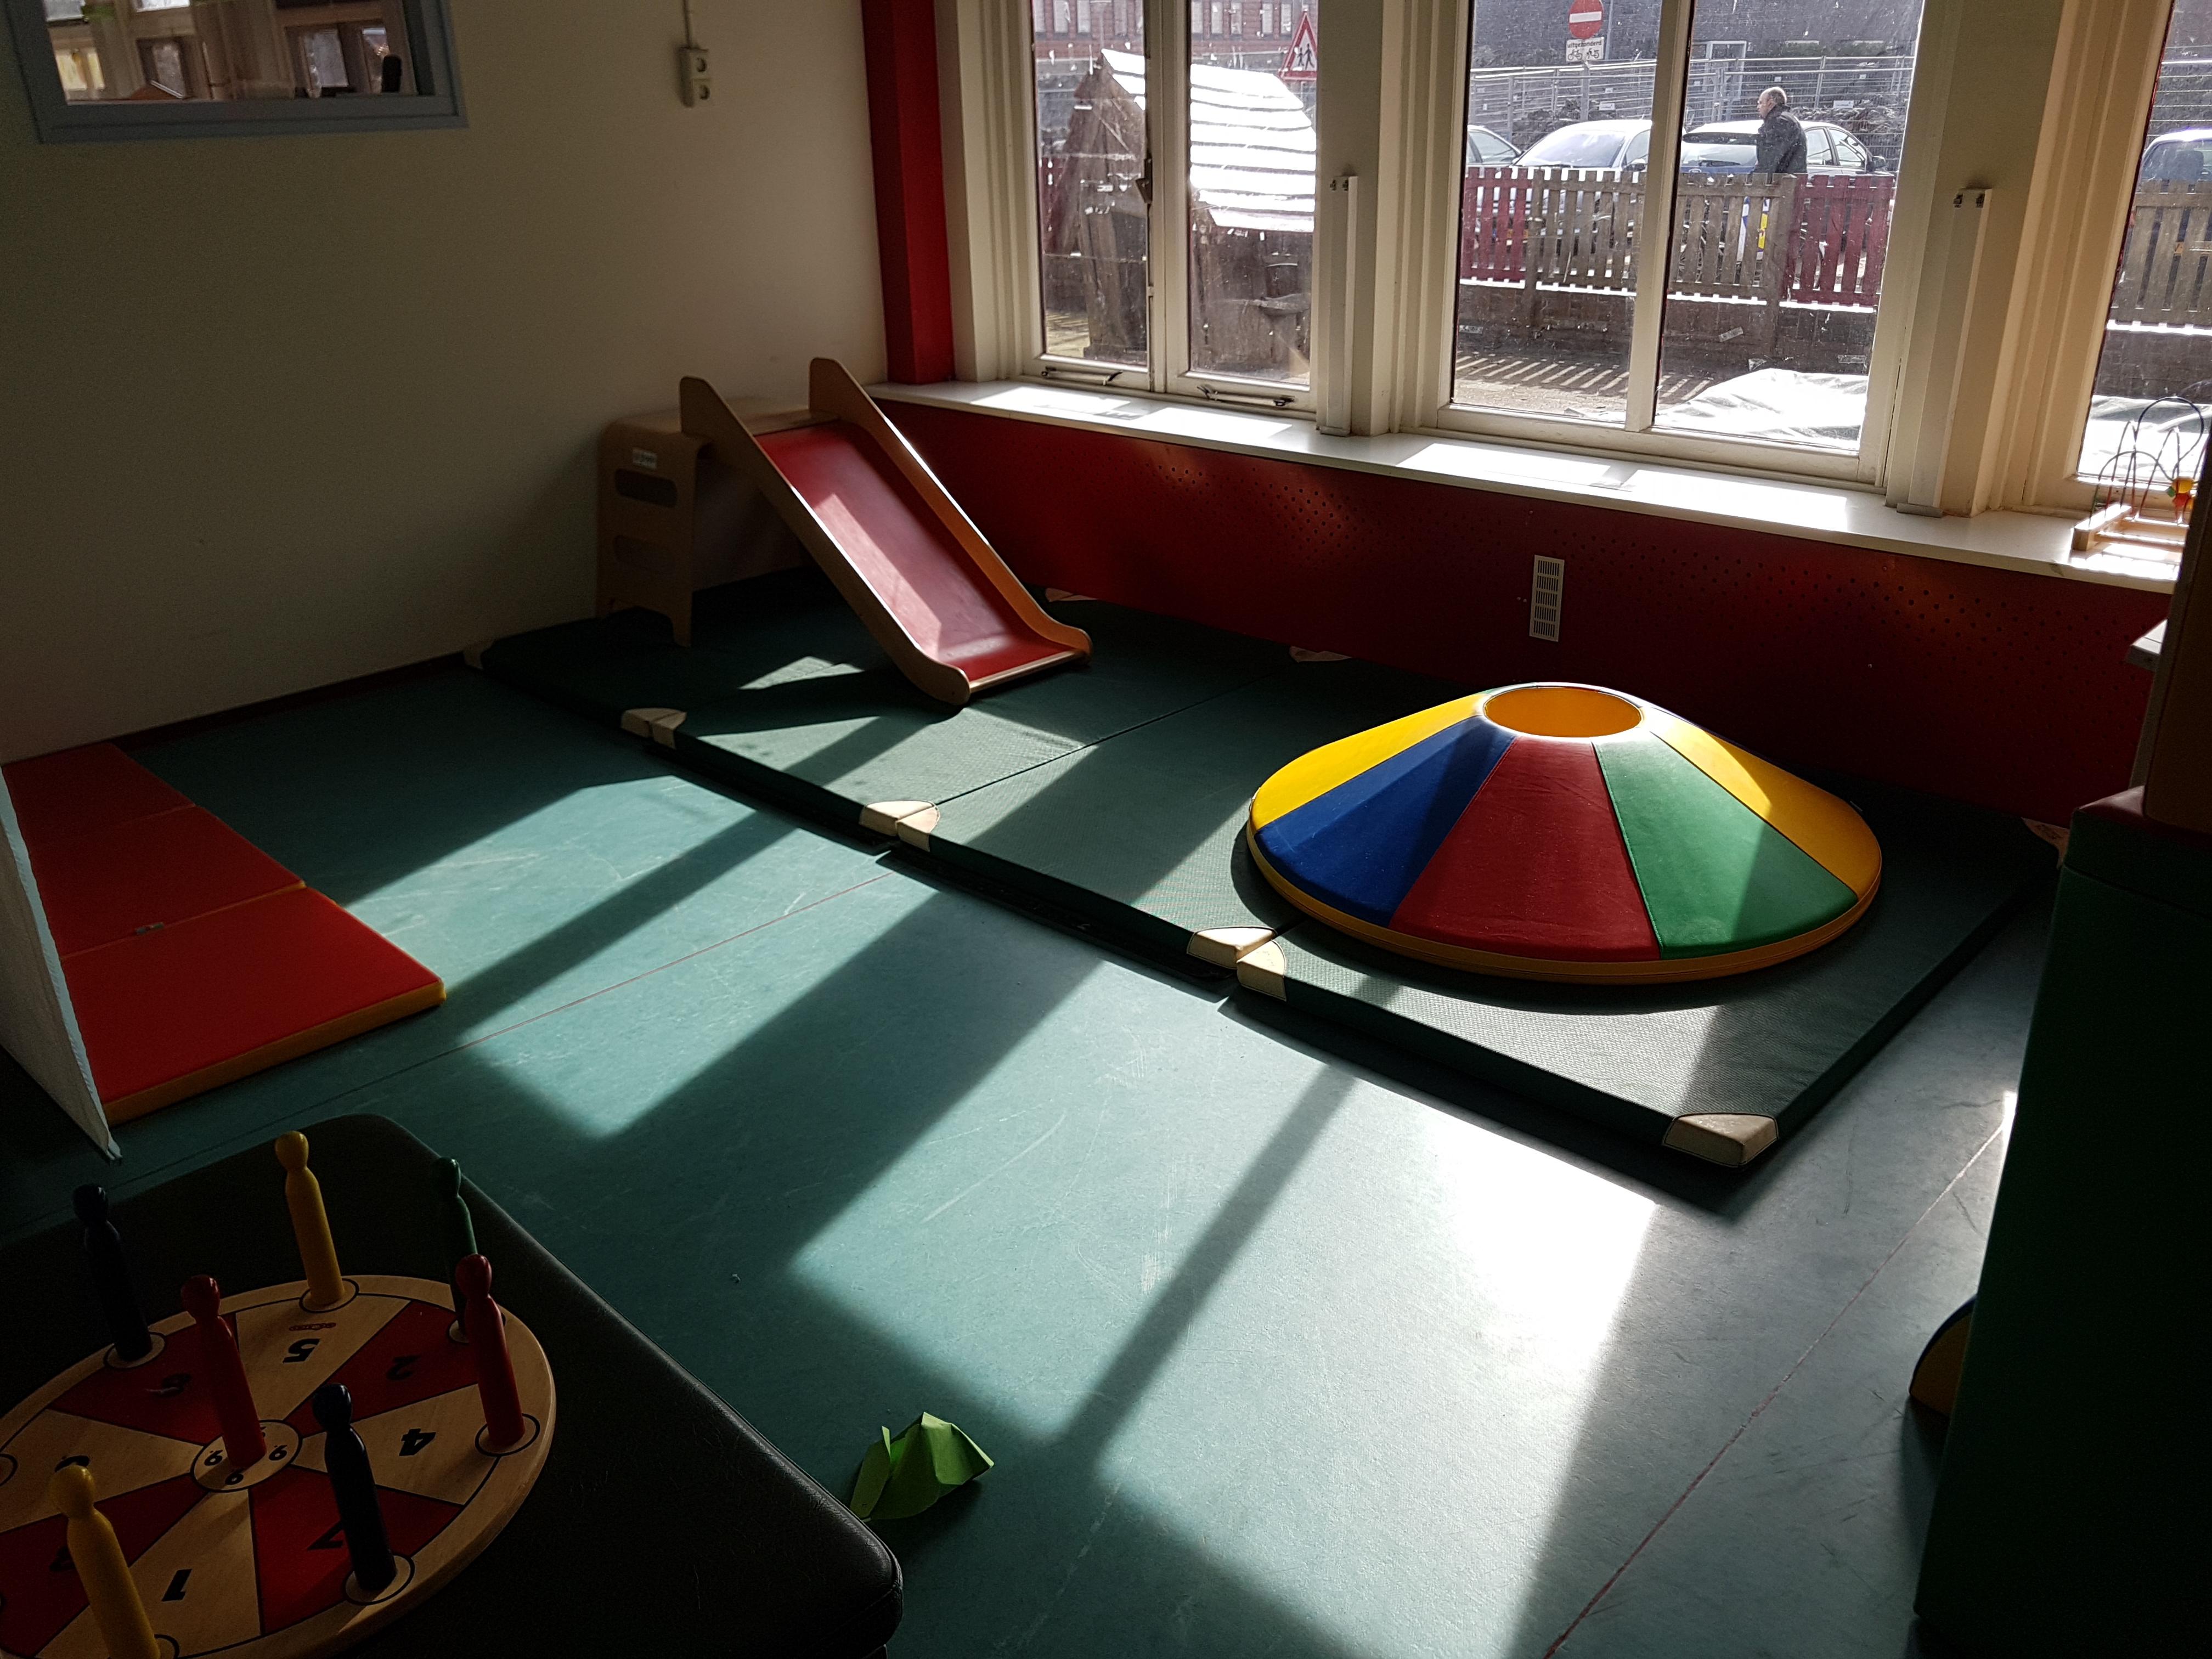 Kinderdagverblijf Het Merelnest Groningen - Kids First COP groep